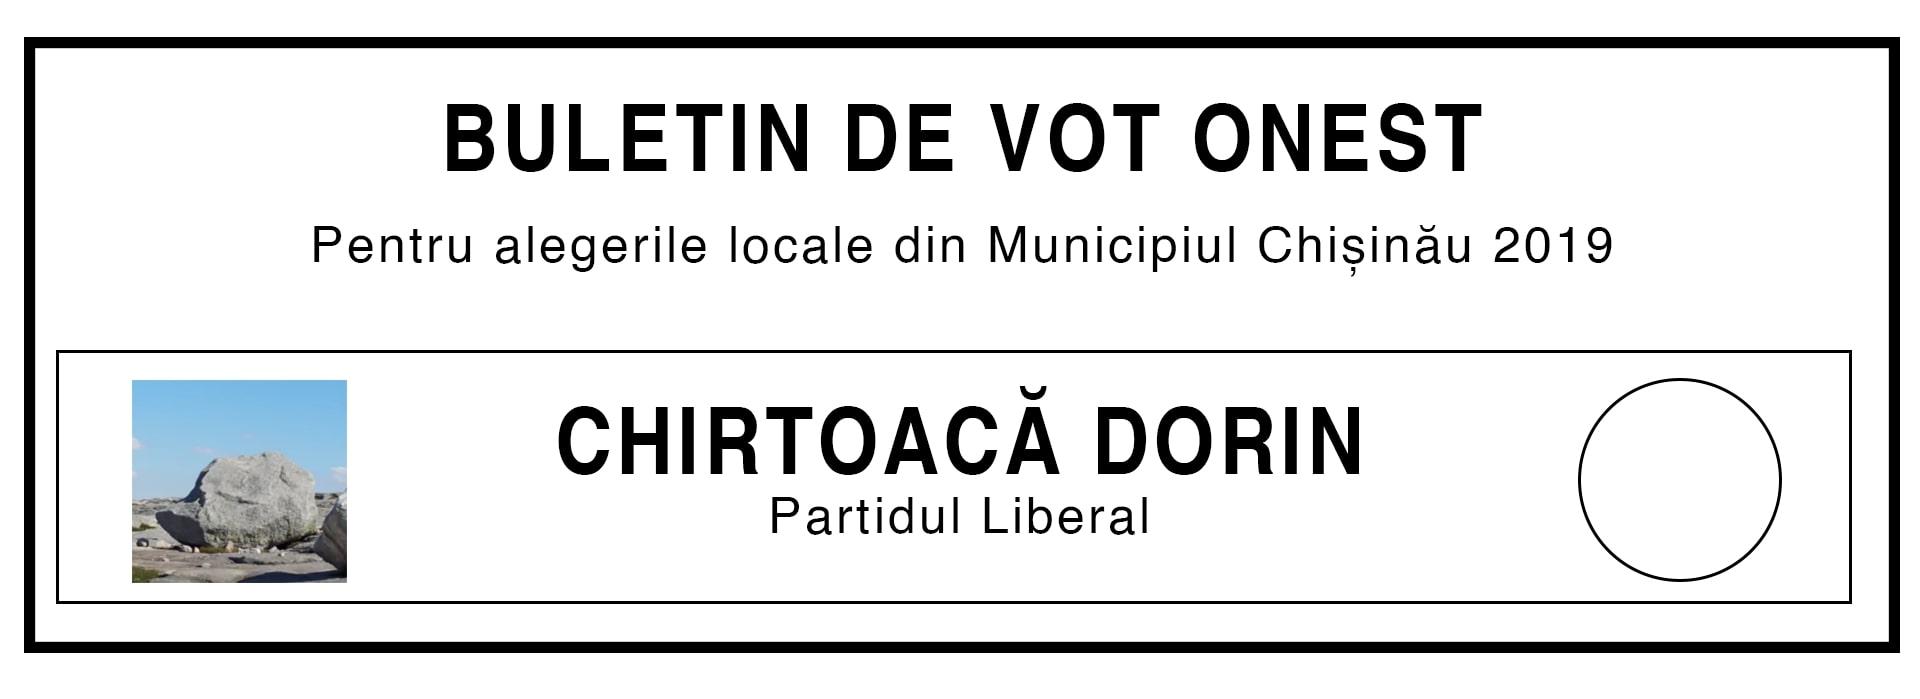 Chirtoaca Dorin